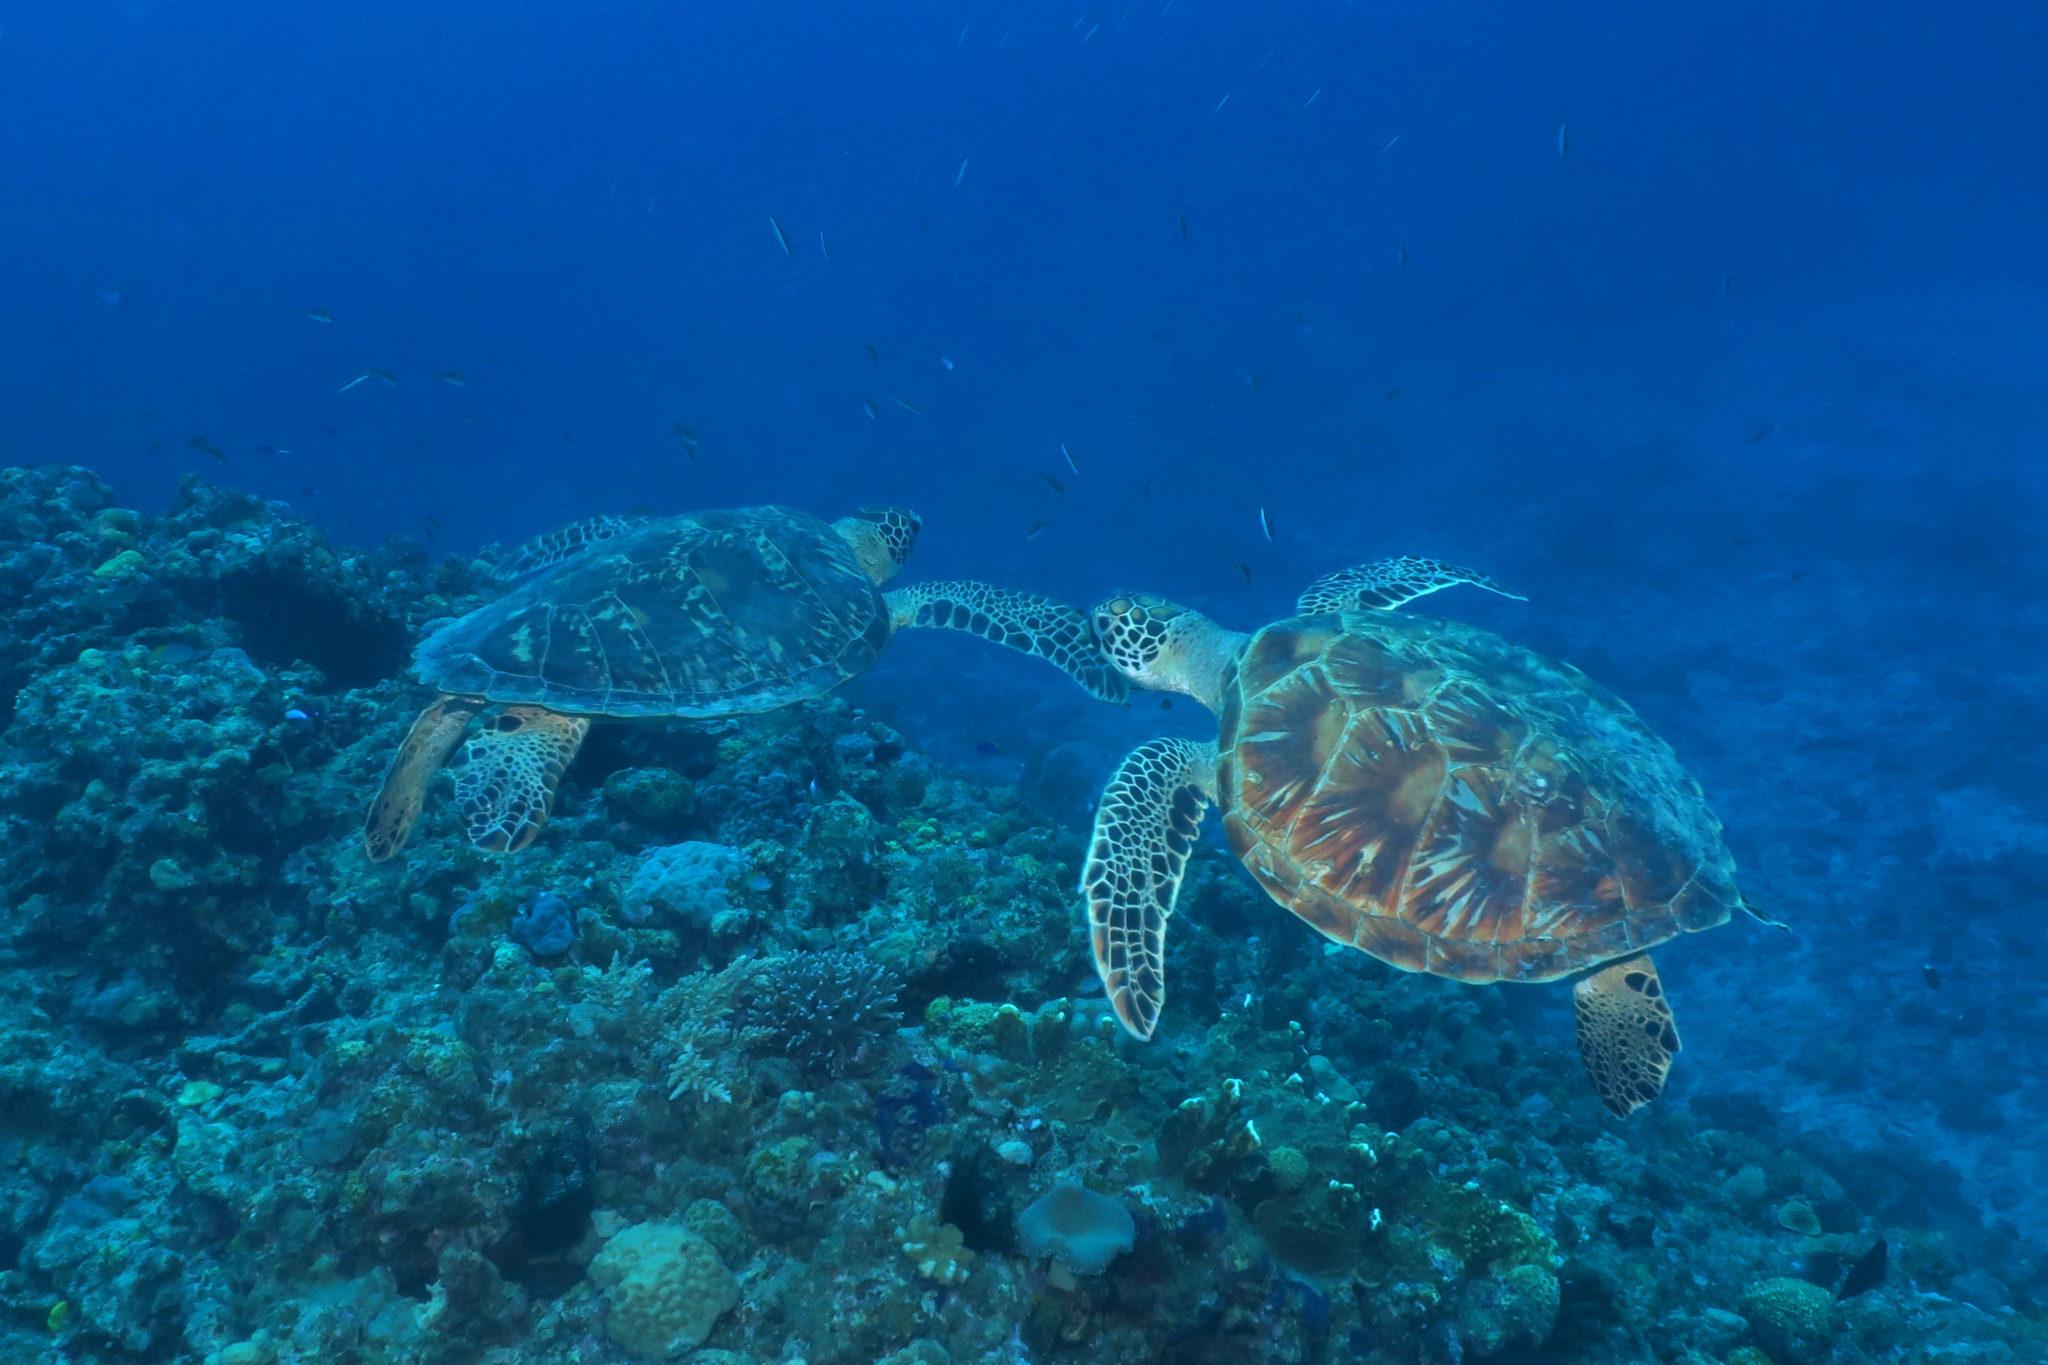 Tortues plongée Okinawa